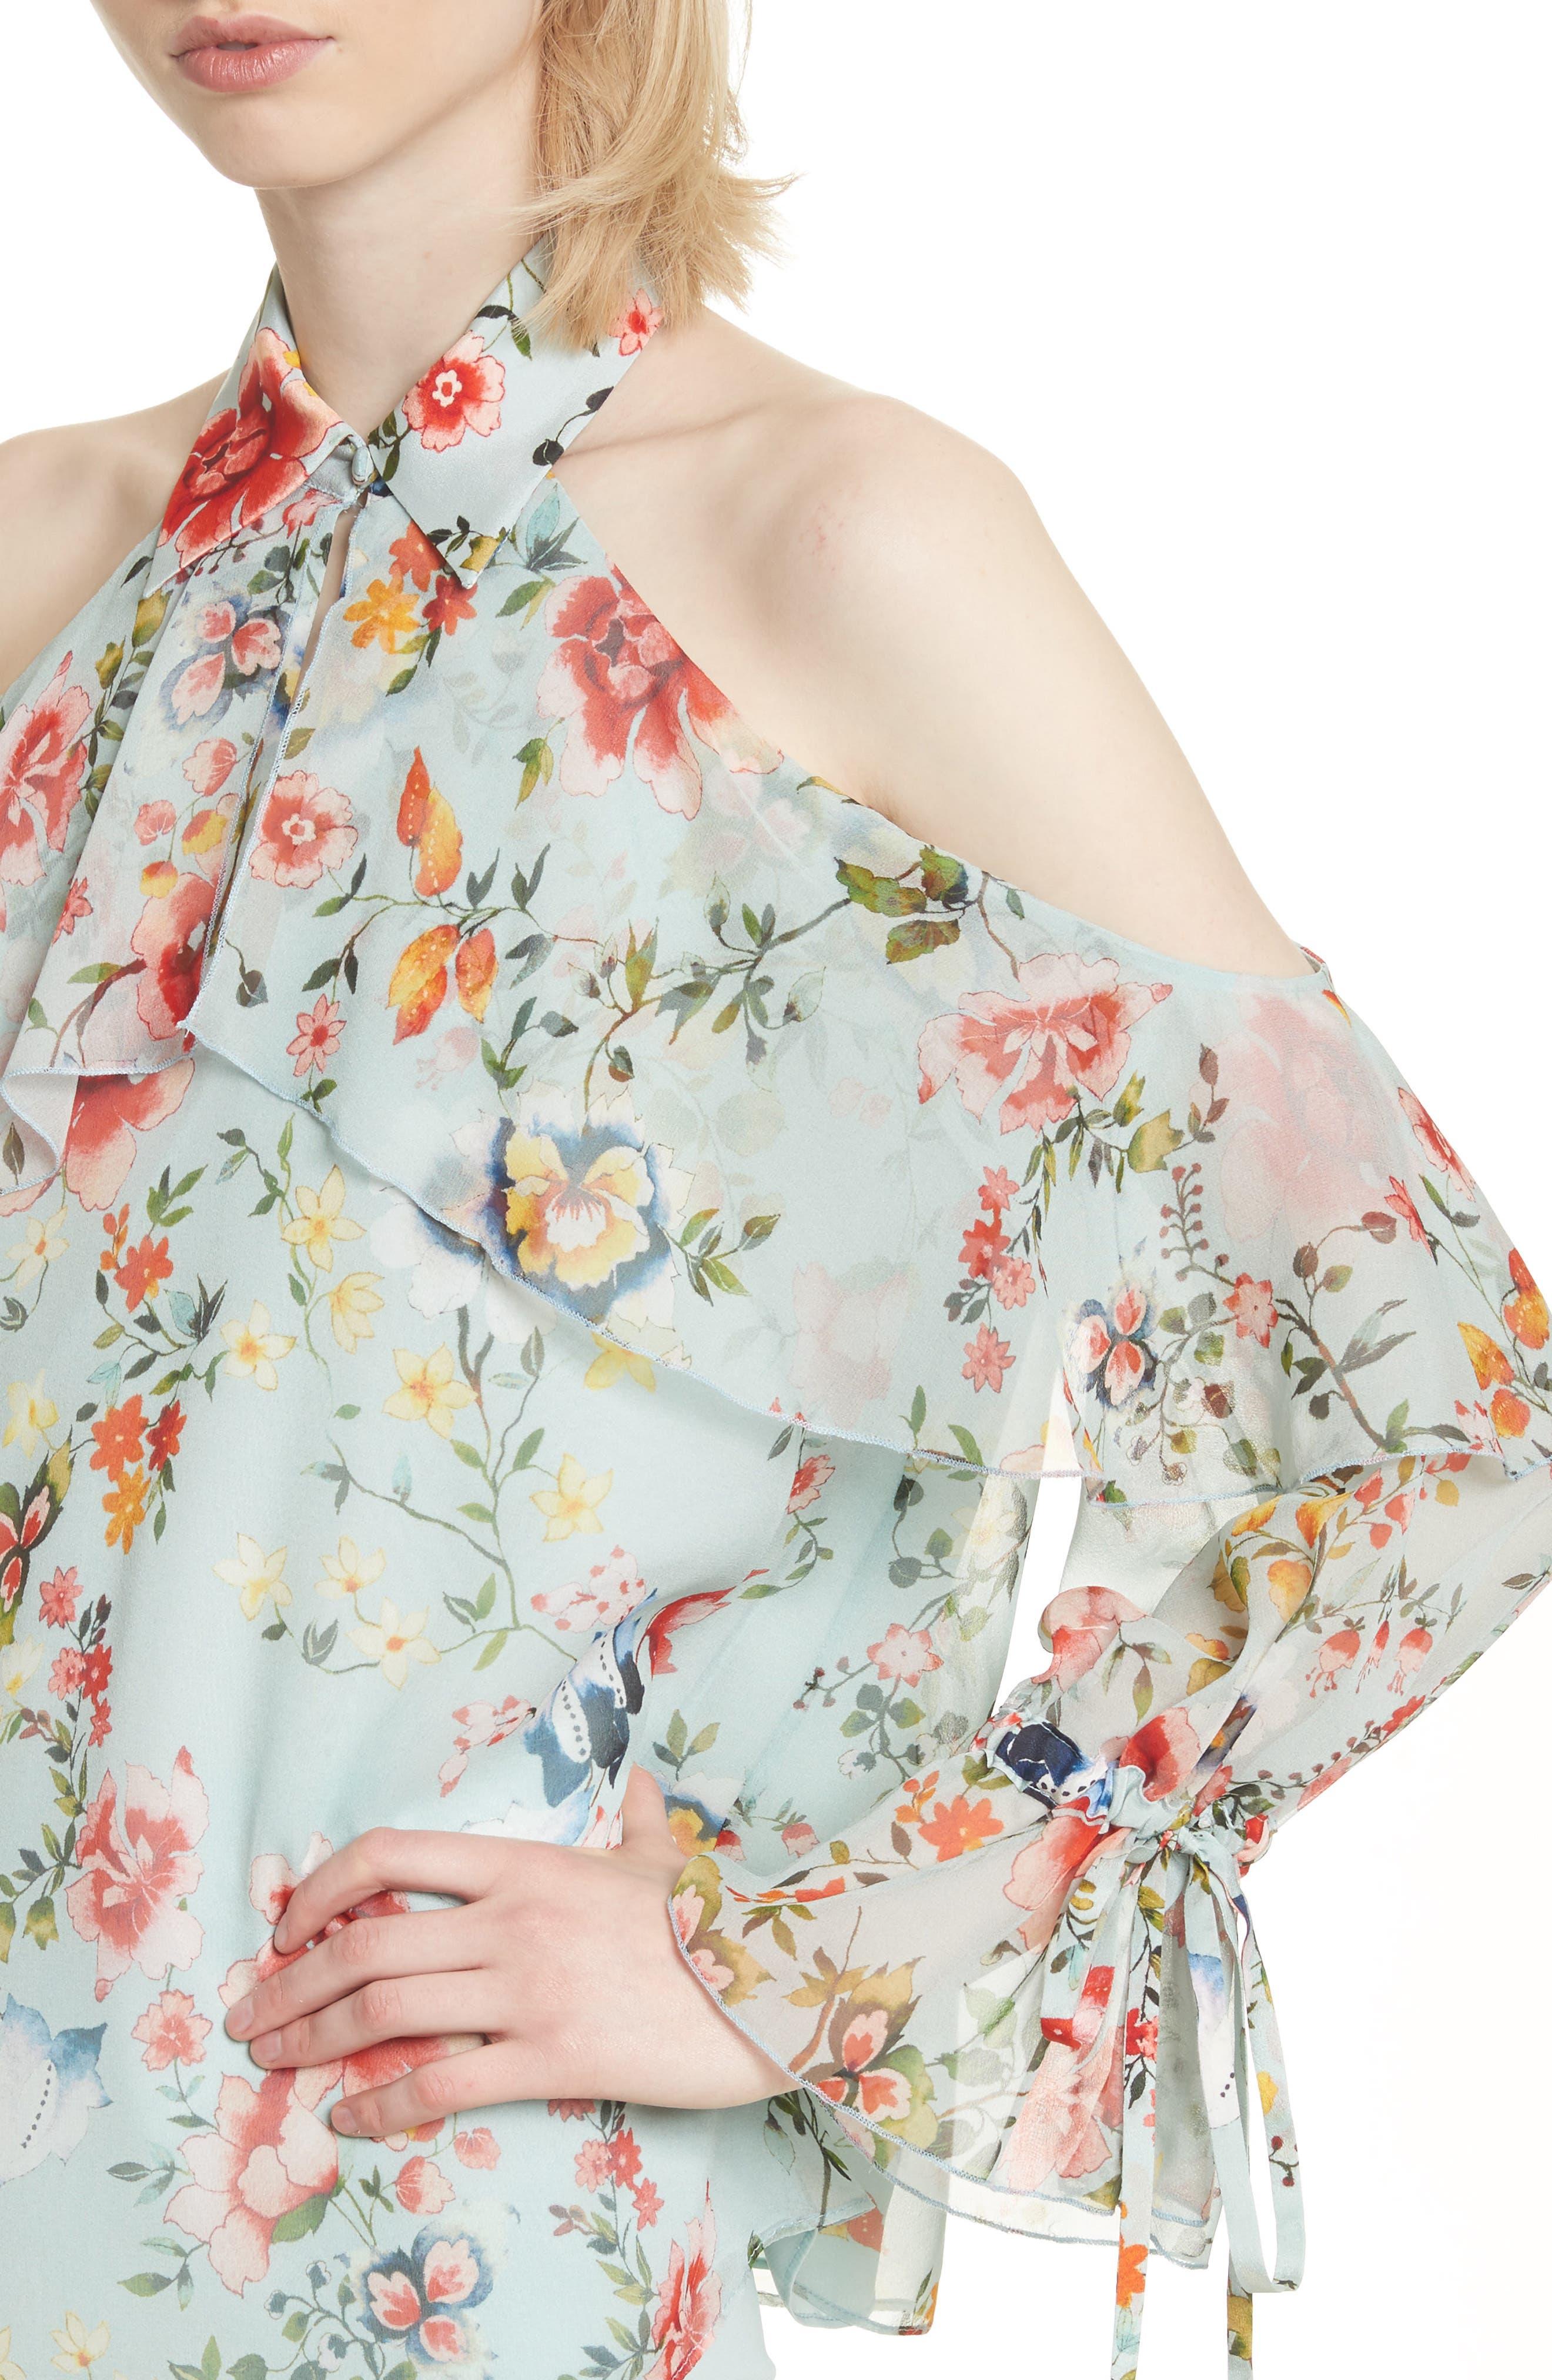 Blayne Cold Shoulder Floral Silk Blouse,                             Alternate thumbnail 4, color,                             Floral Soiree-Dusty Aqua